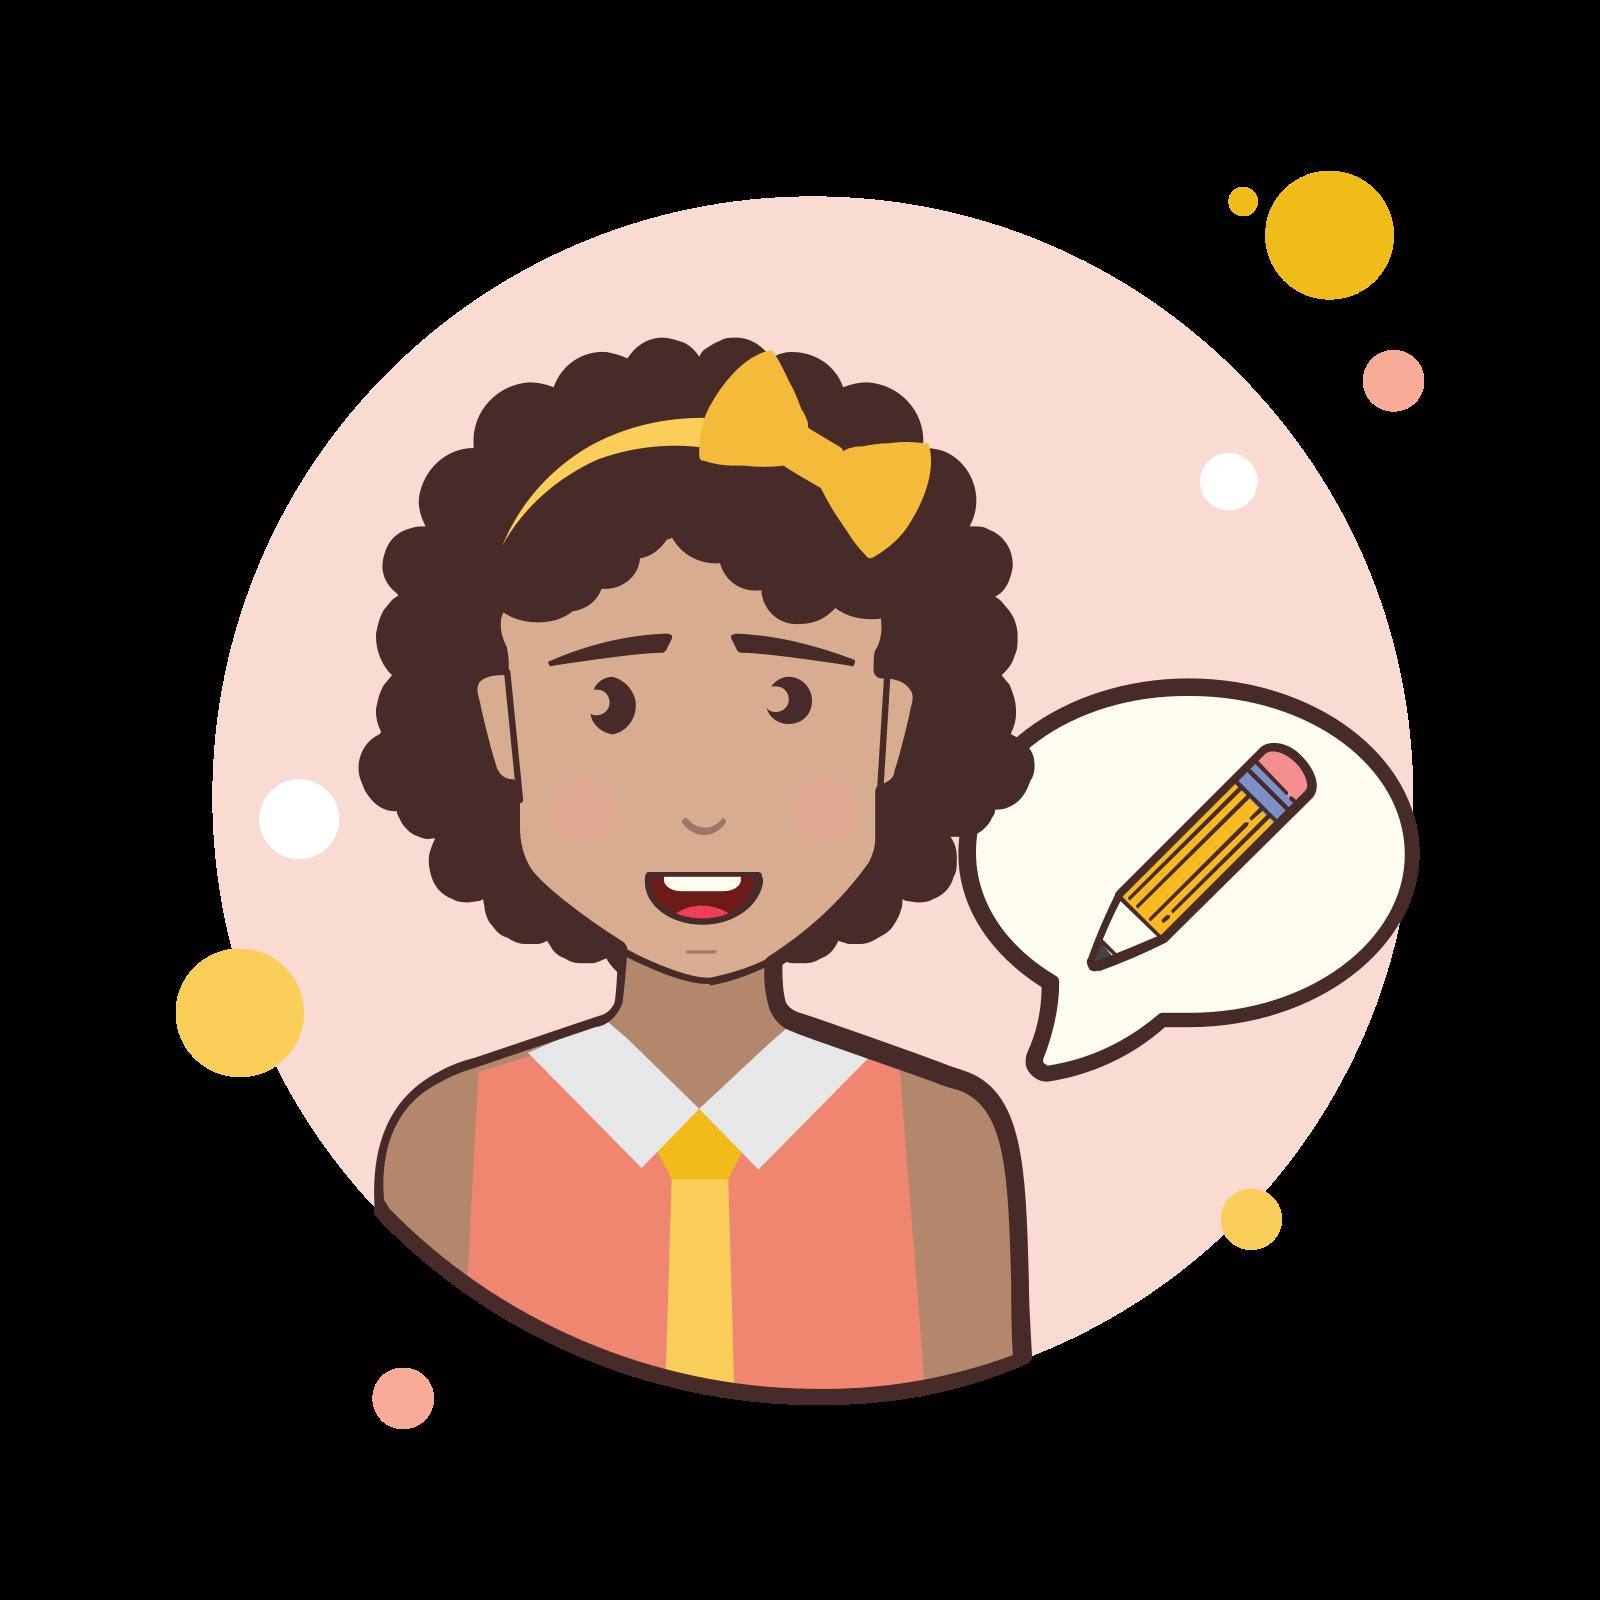 Short Curly Hair Girl Pencil icon